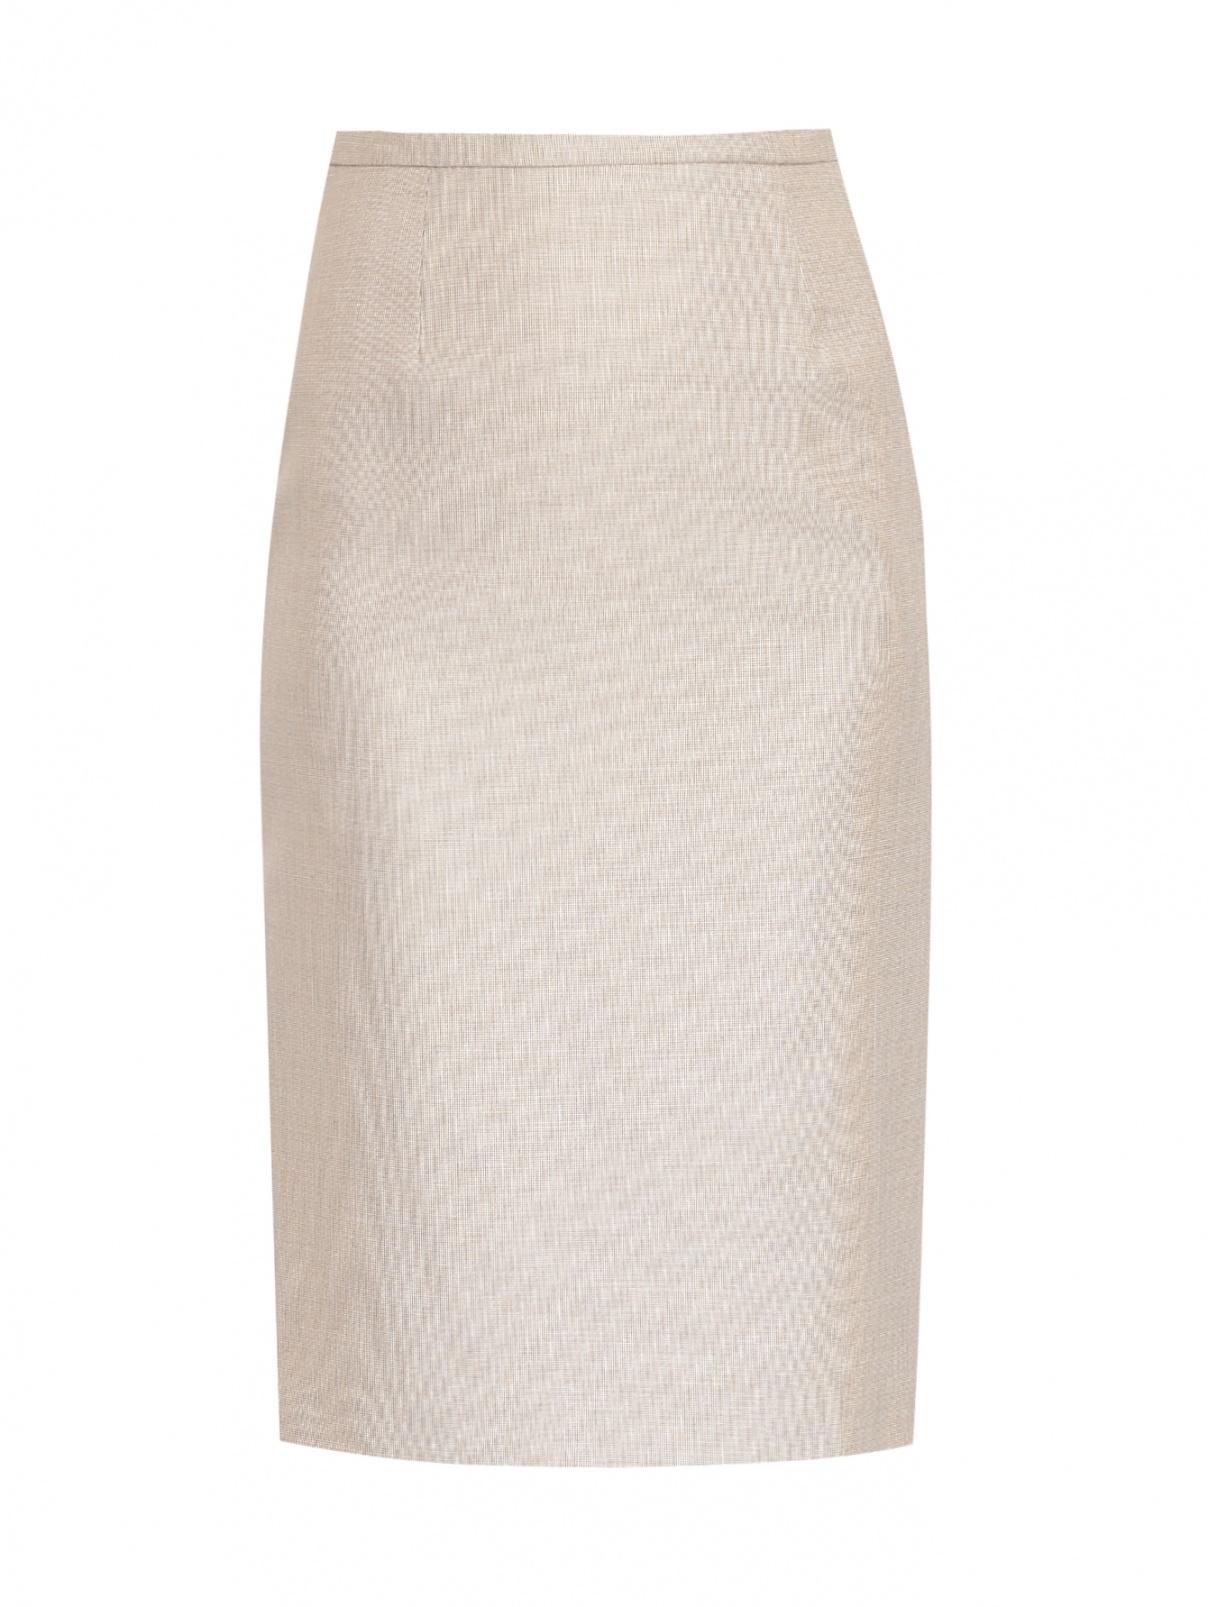 Юбка-миди из шерсти с узором Max Mara  –  Общий вид